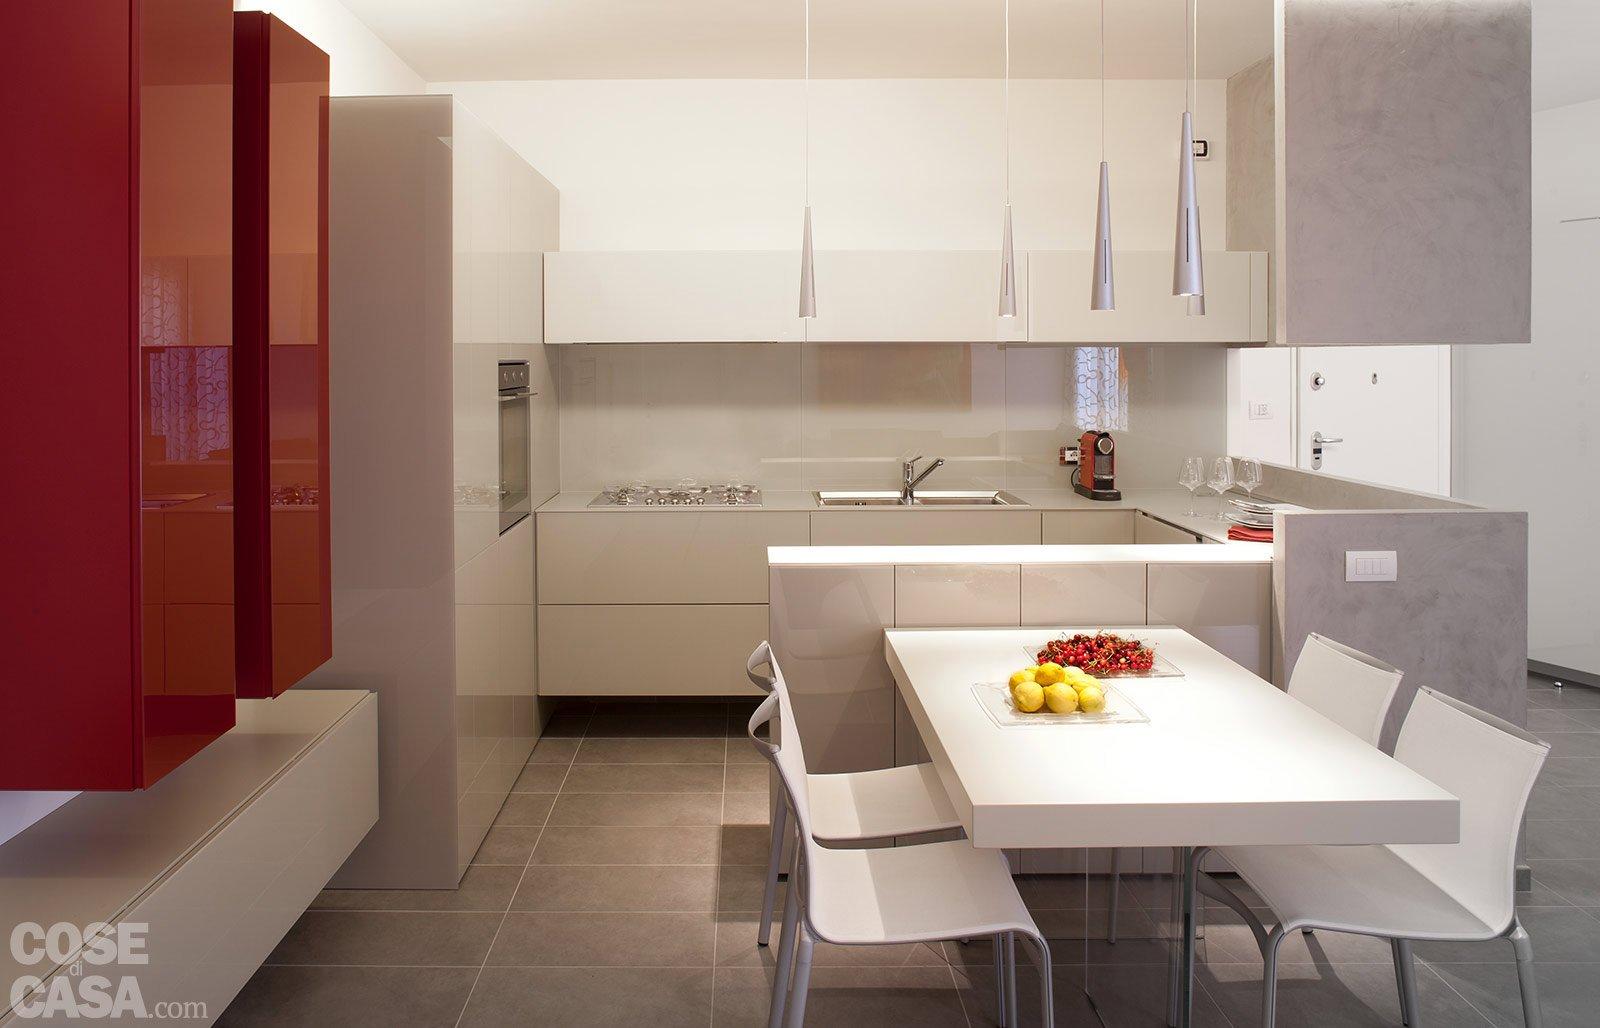 Casabook Immobiliare: febbraio 2014